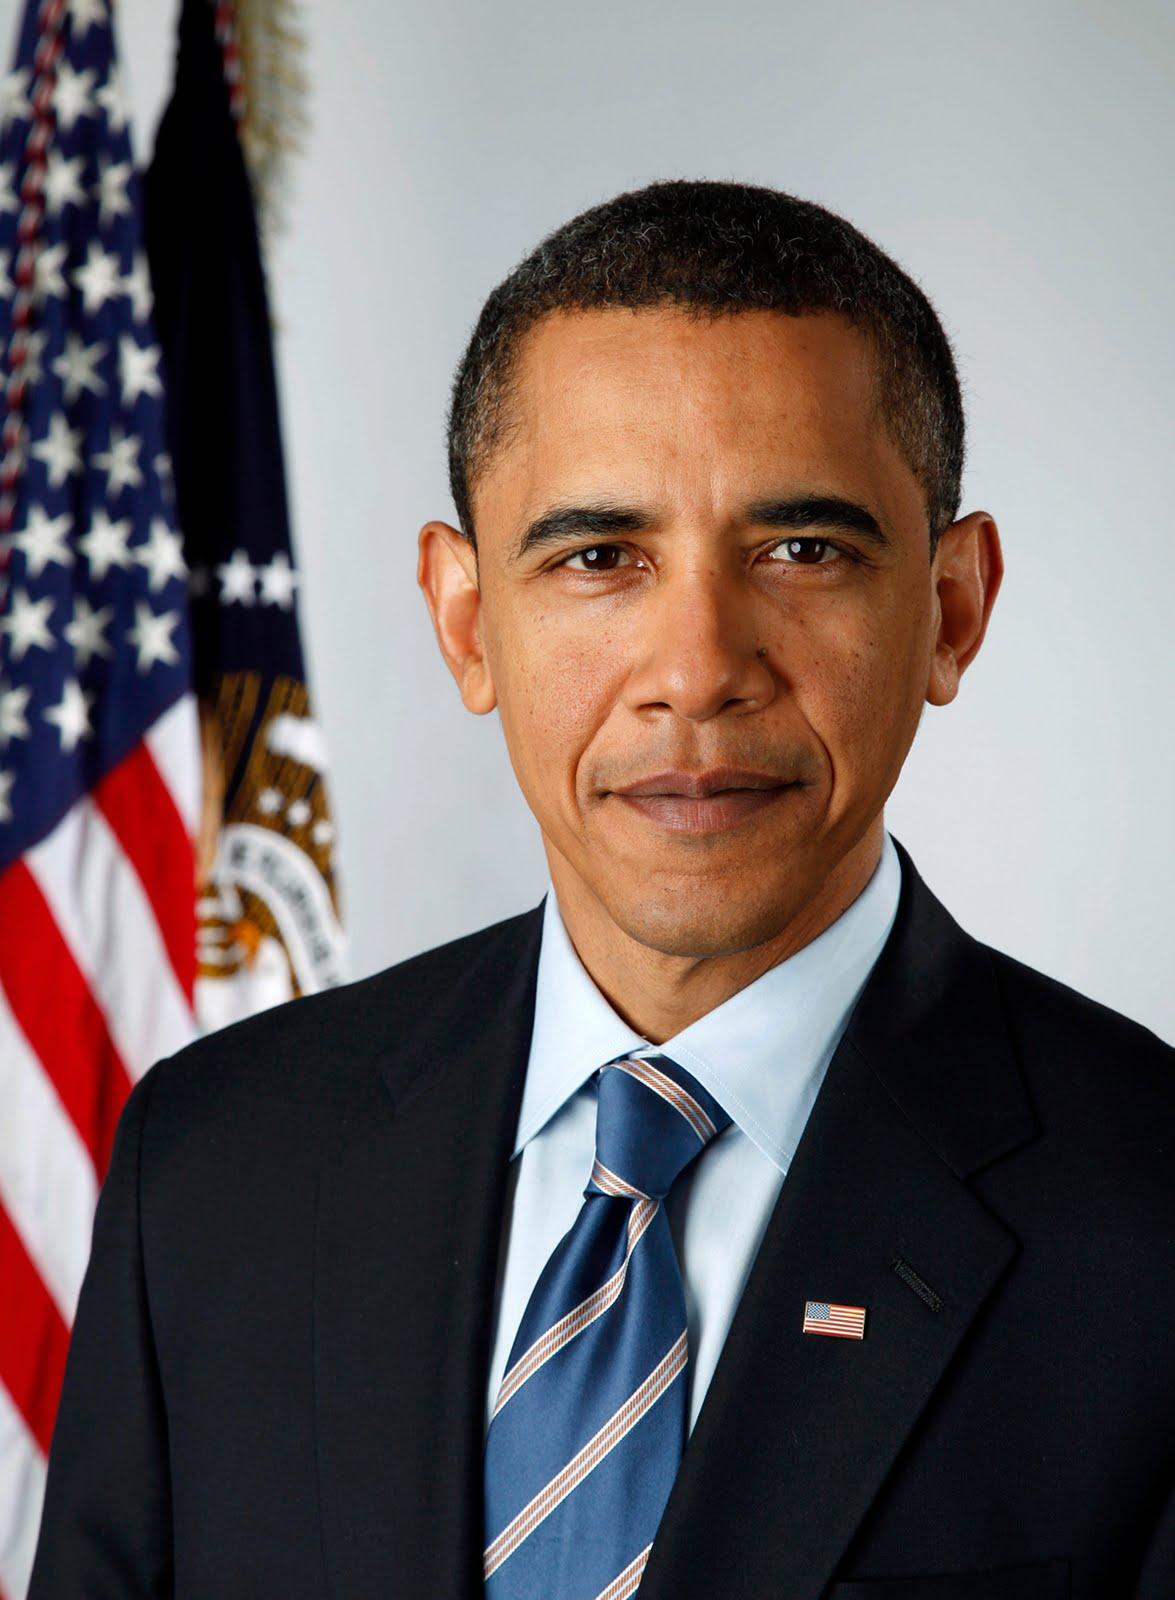 http://1.bp.blogspot.com/-ueaUH_grT48/TzHmxFK-XbI/AAAAAAAAM-M/xMAPLR_GVp8/s1600/Barack+Obama+Funny+Picture+(9).jpg